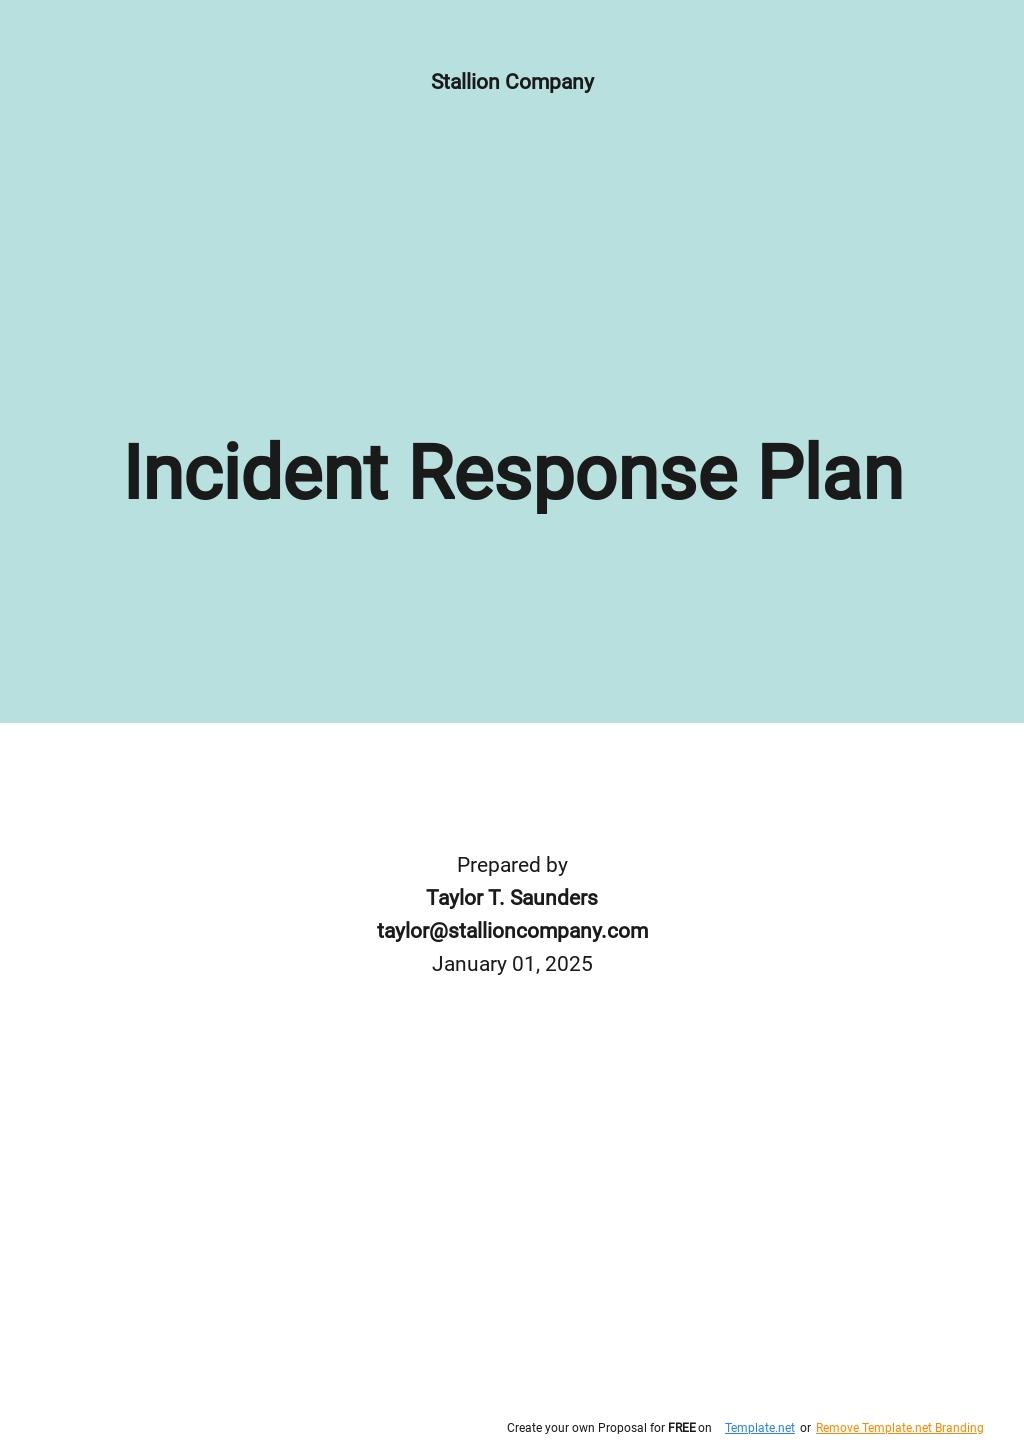 Simple Incident Response Plan Template.jpe